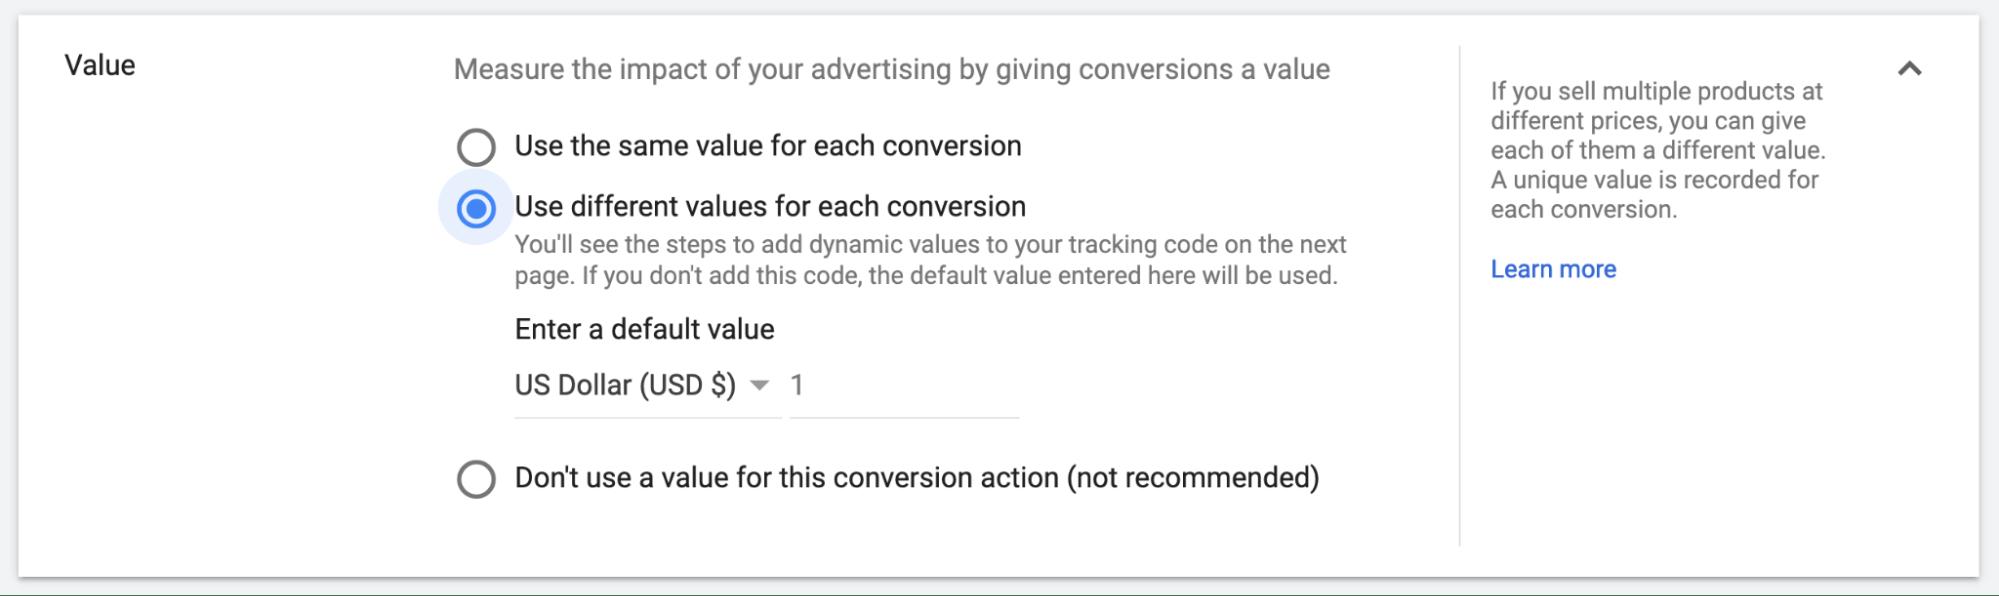 Google Ads Conversion Value Options